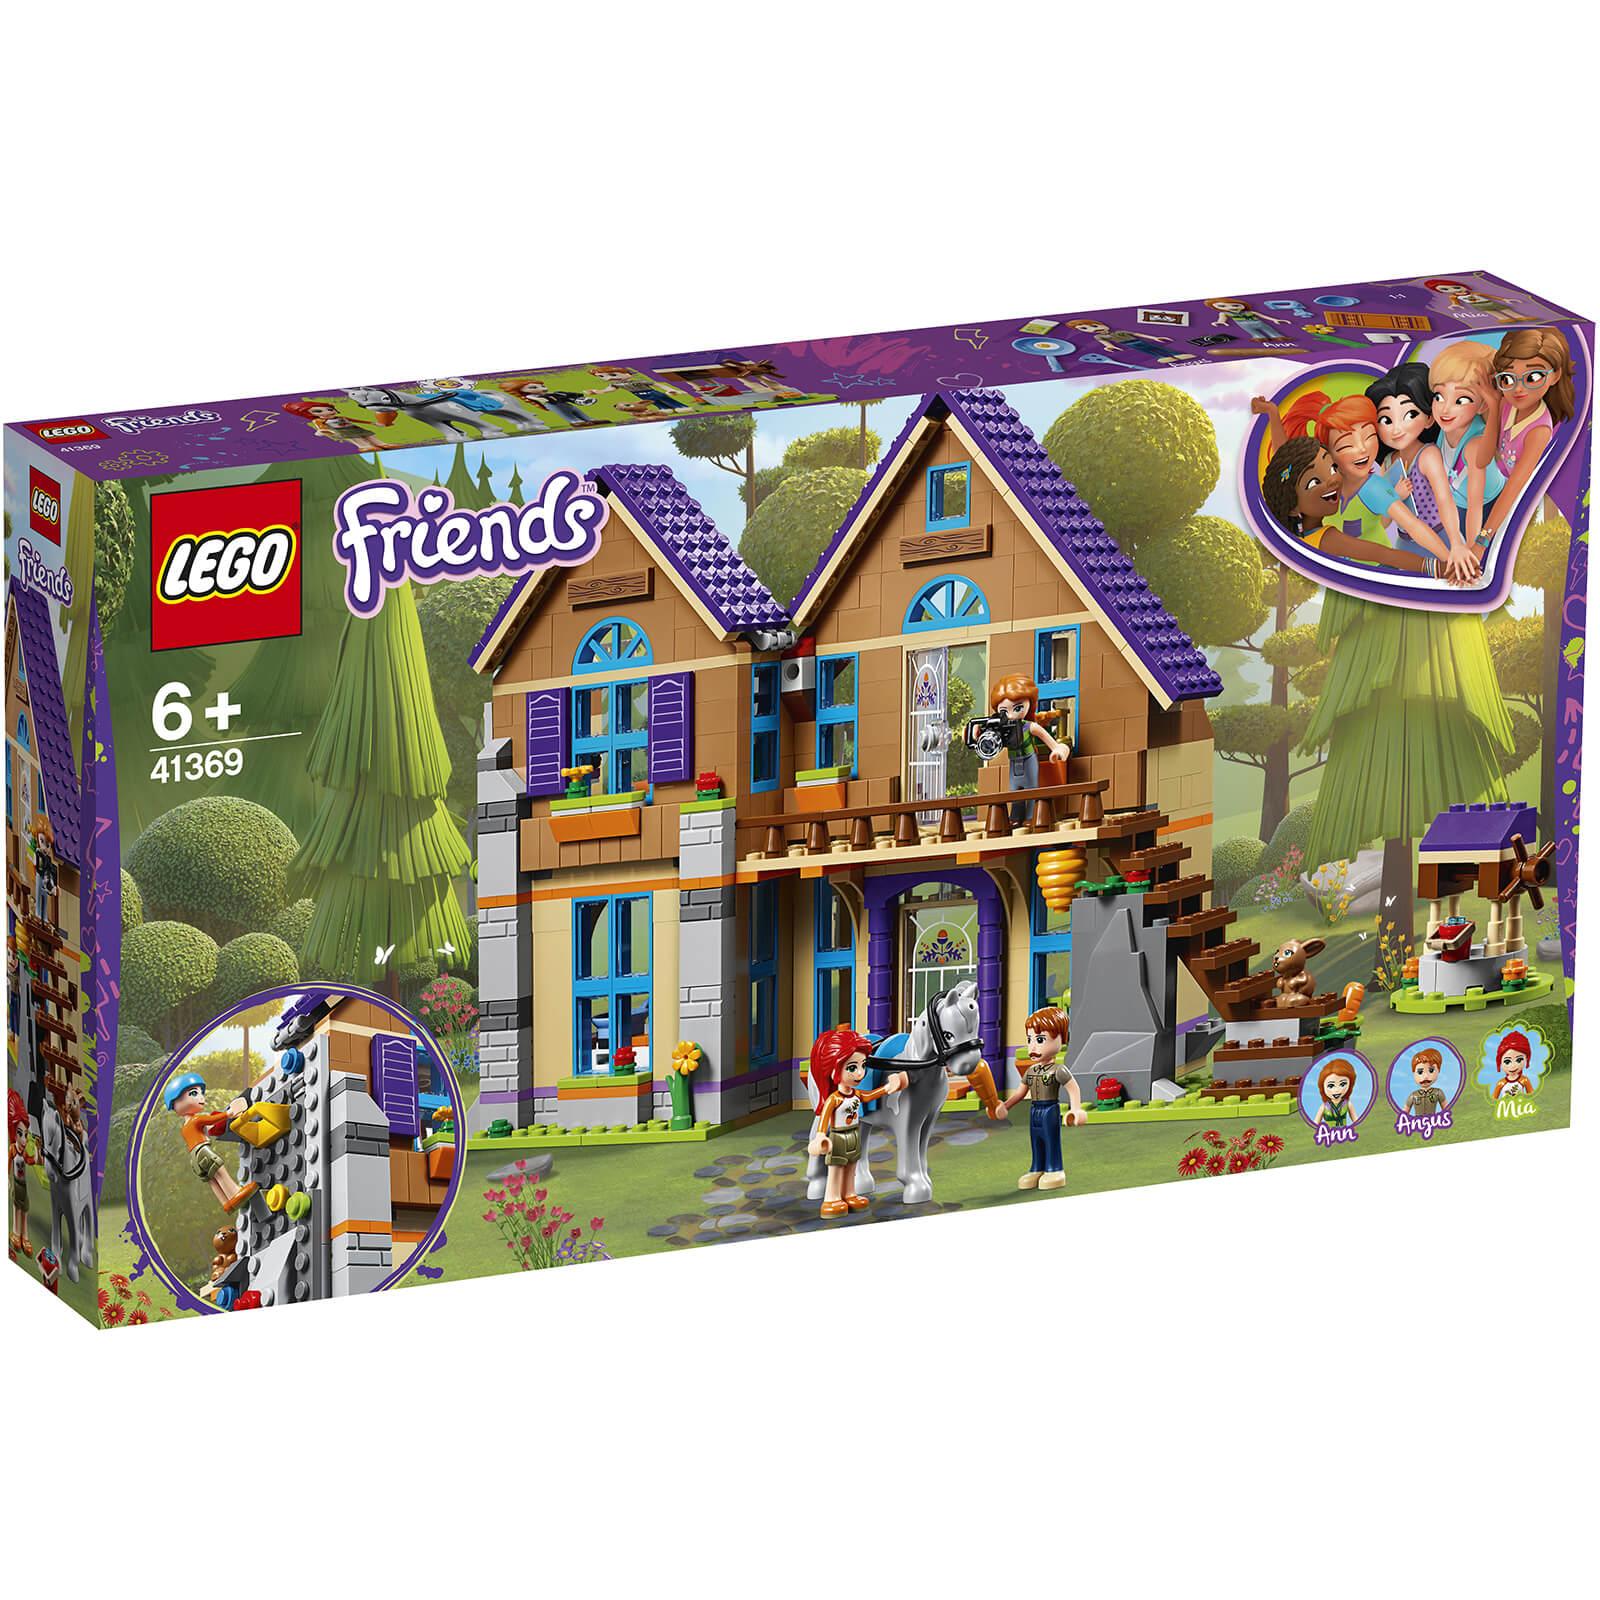 Lego Friends: Mia's House (41369)